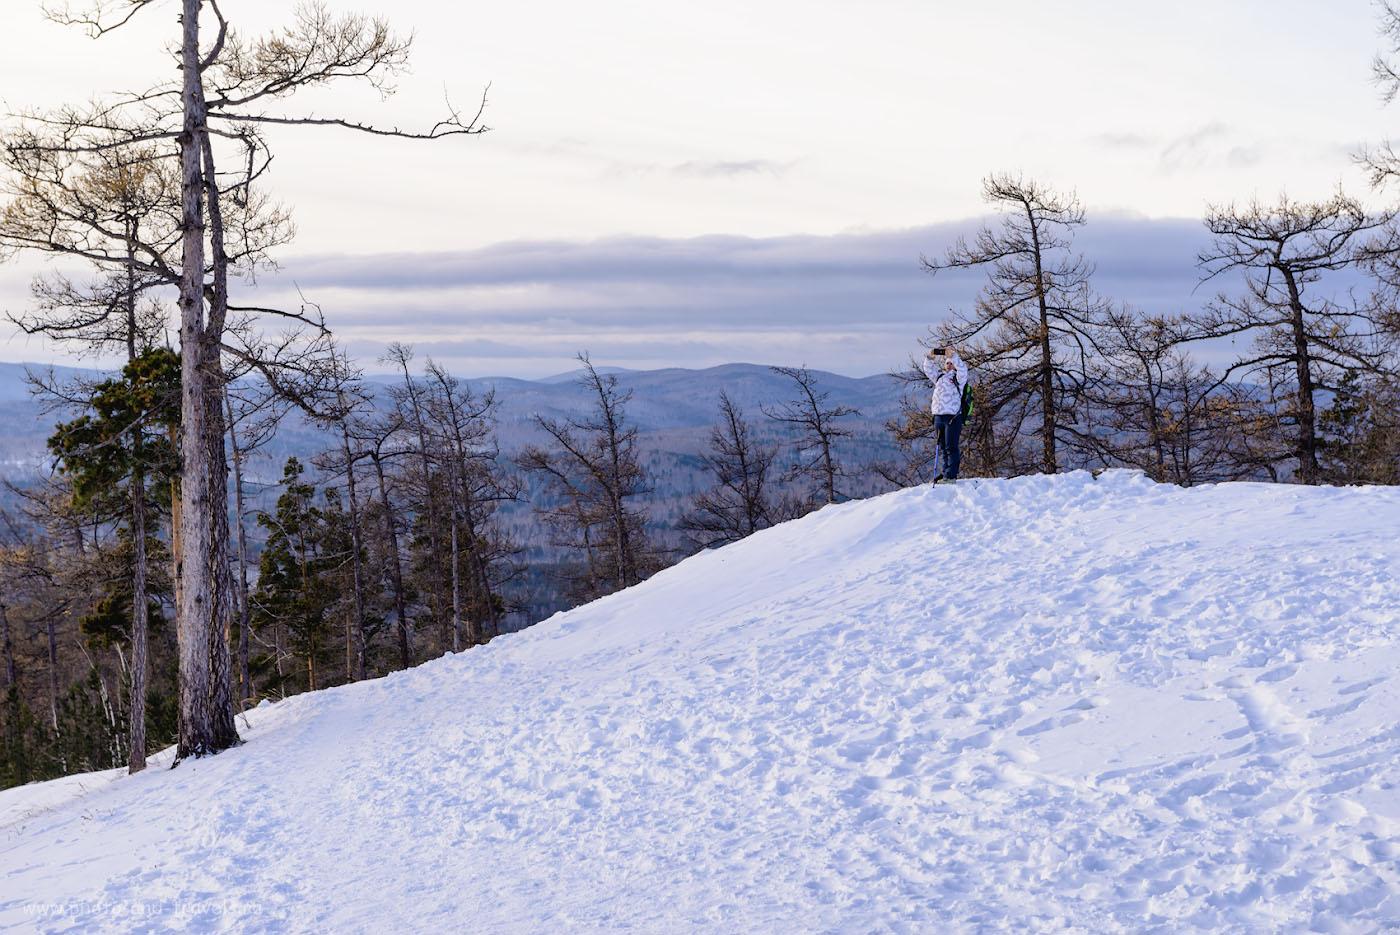 Фото 3. Съемки на вершине малого Сугомака. Фотоаппарат Nikon D610, объектив Nikon 24-70mm f/2.8. Параметры: 1/160, +0.67, 8.0, 160, 70.